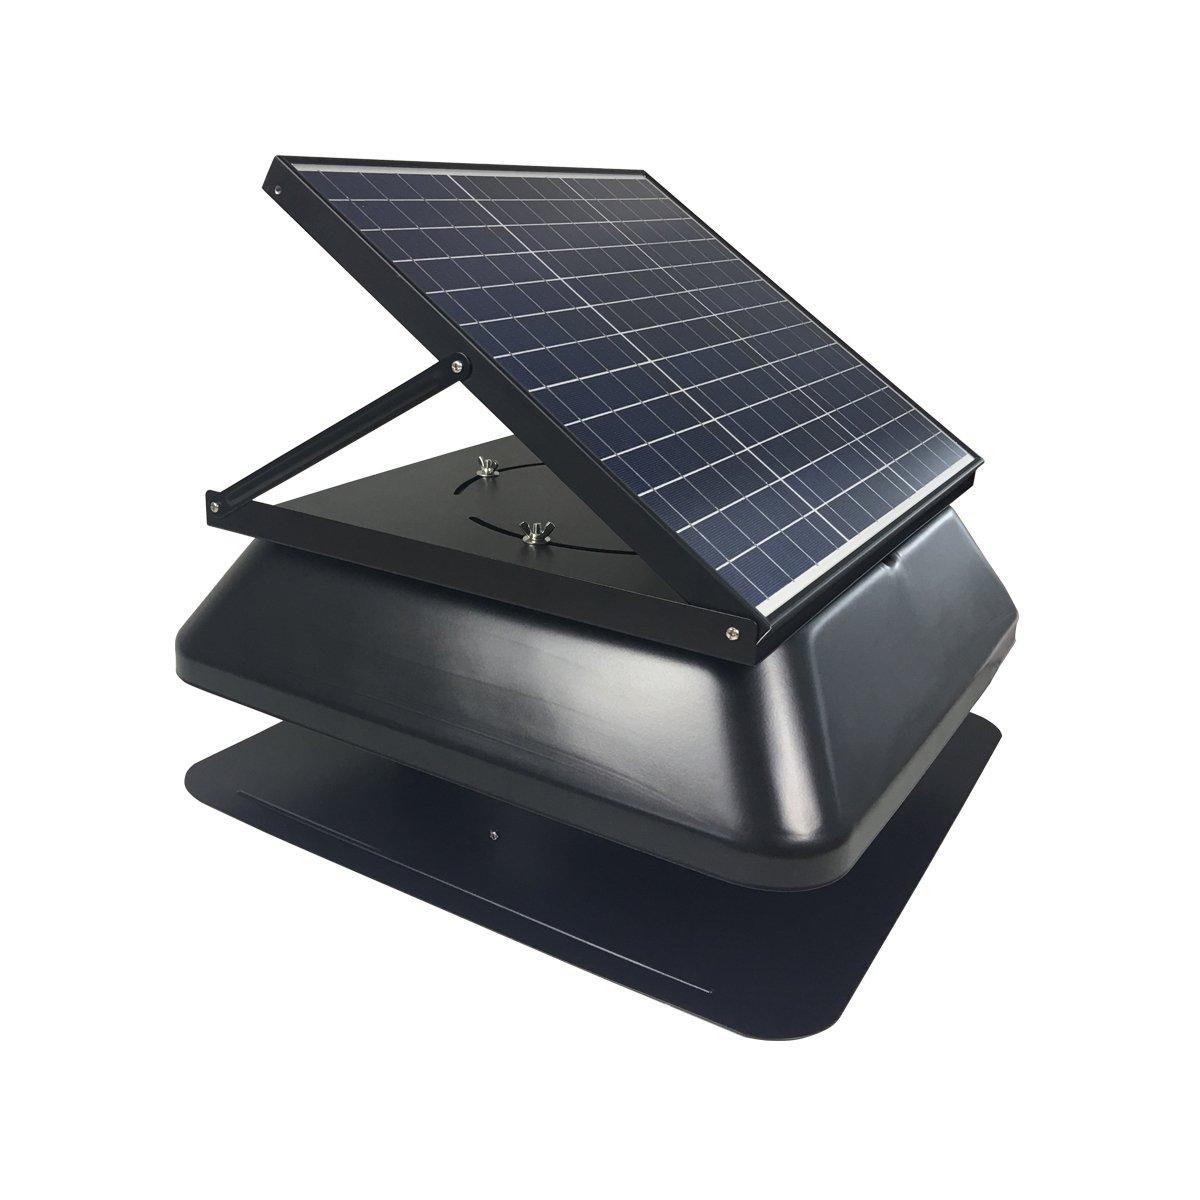 Best Solar Panels 2020.Top 12 Best Solar Powered Attic Fans Reviews 2018 2020 On